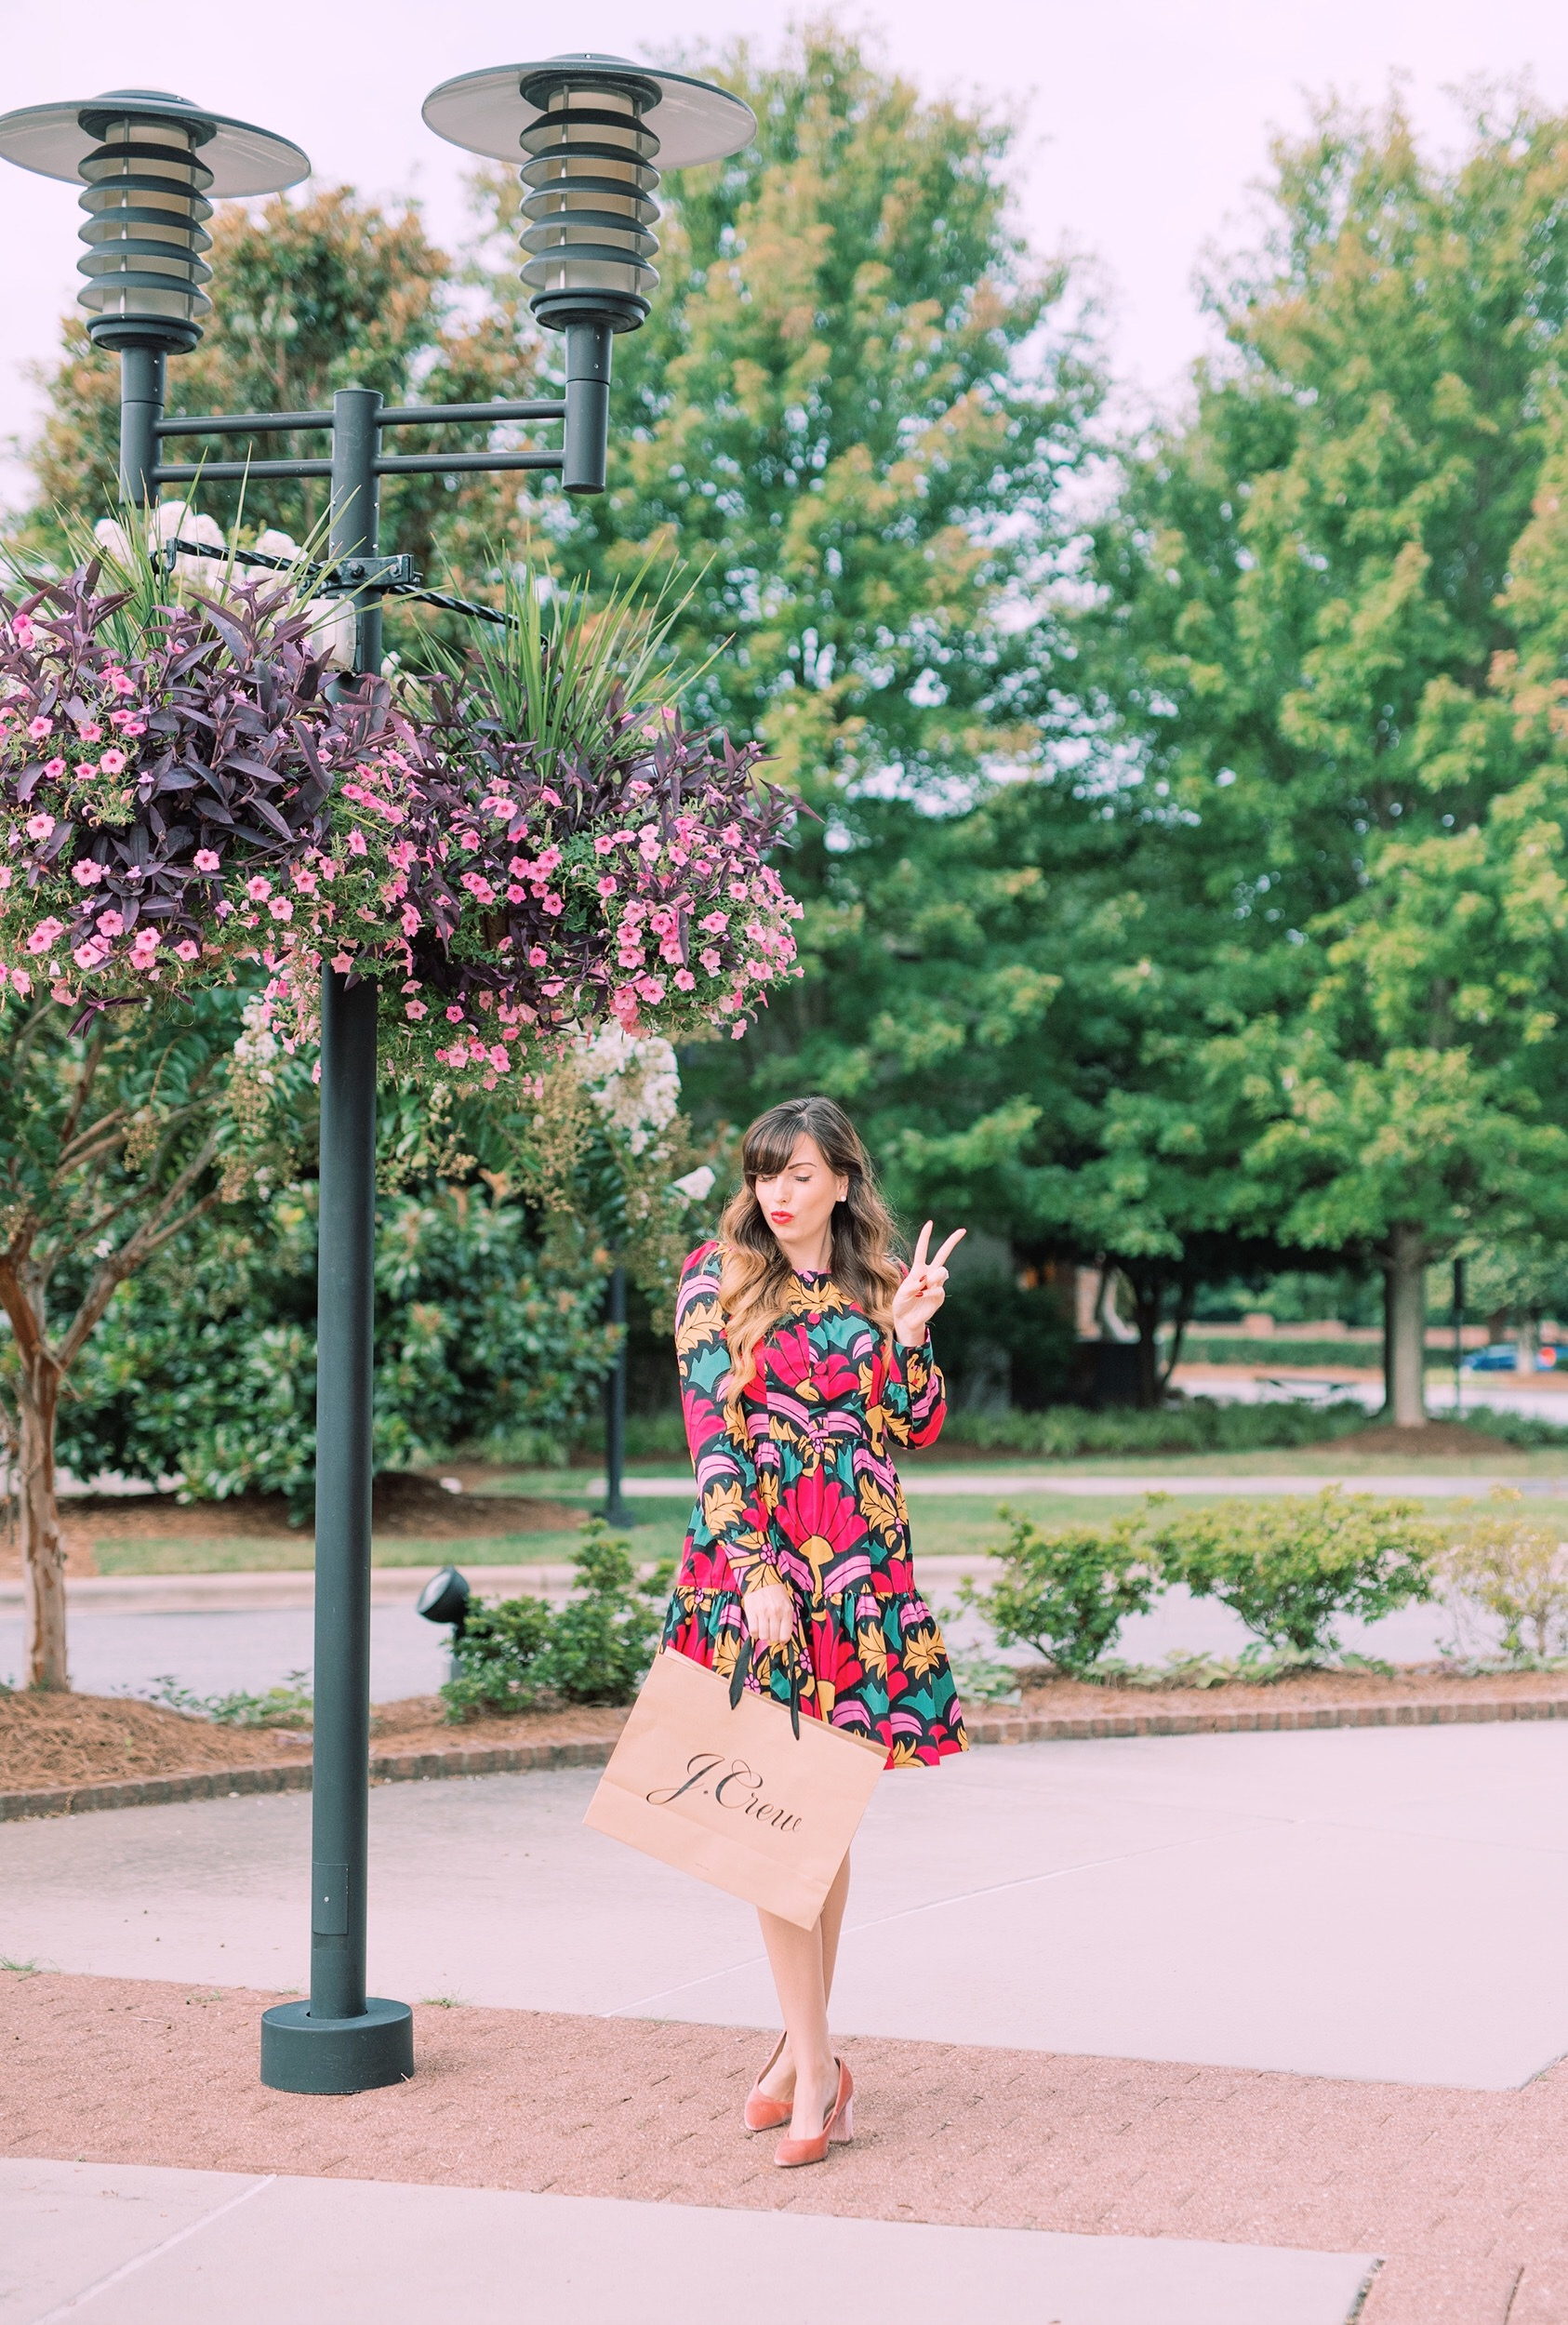 jcrew retro floral dress.JPG